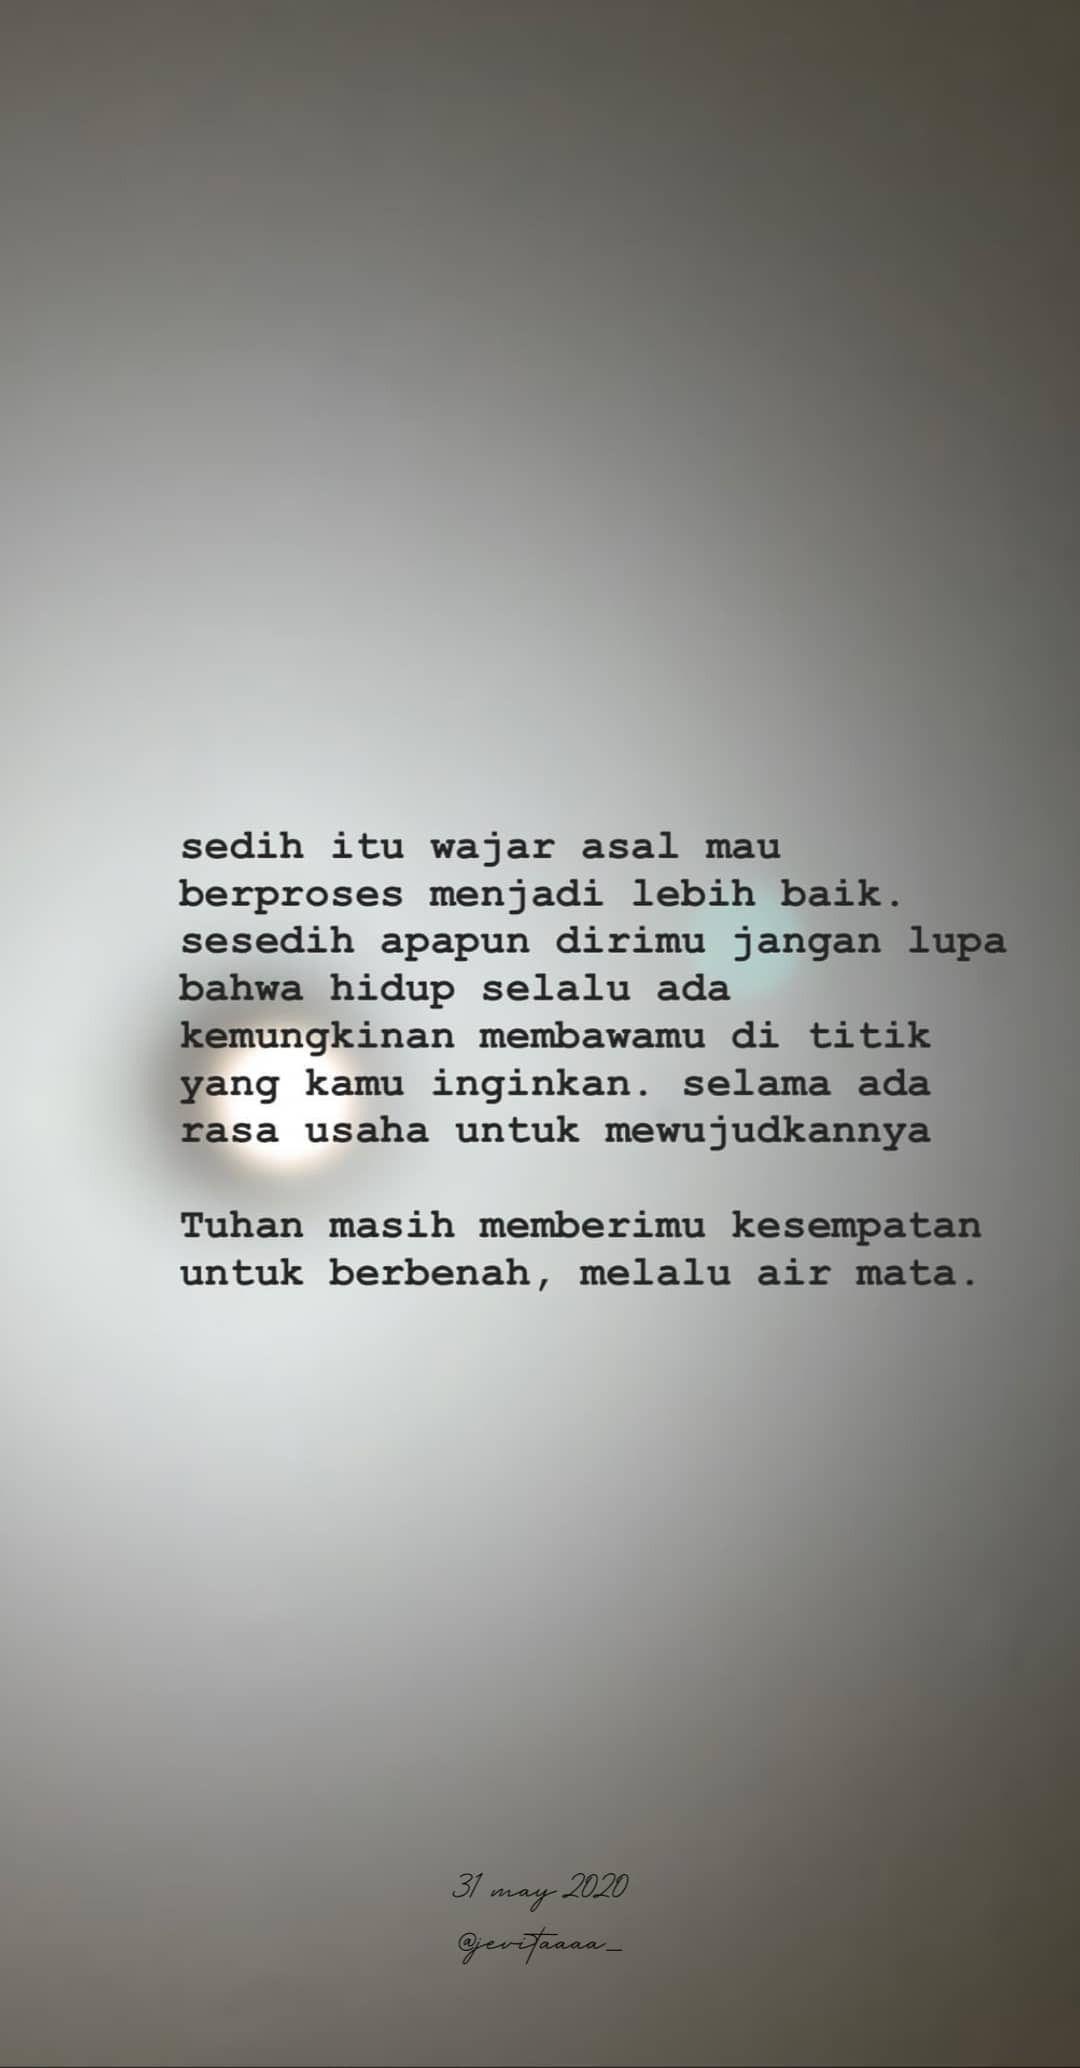 Pin Oleh Alda Anggraenii Di Text Quotes Kutipan Terbaik Kutipan Motivasi Motivasi